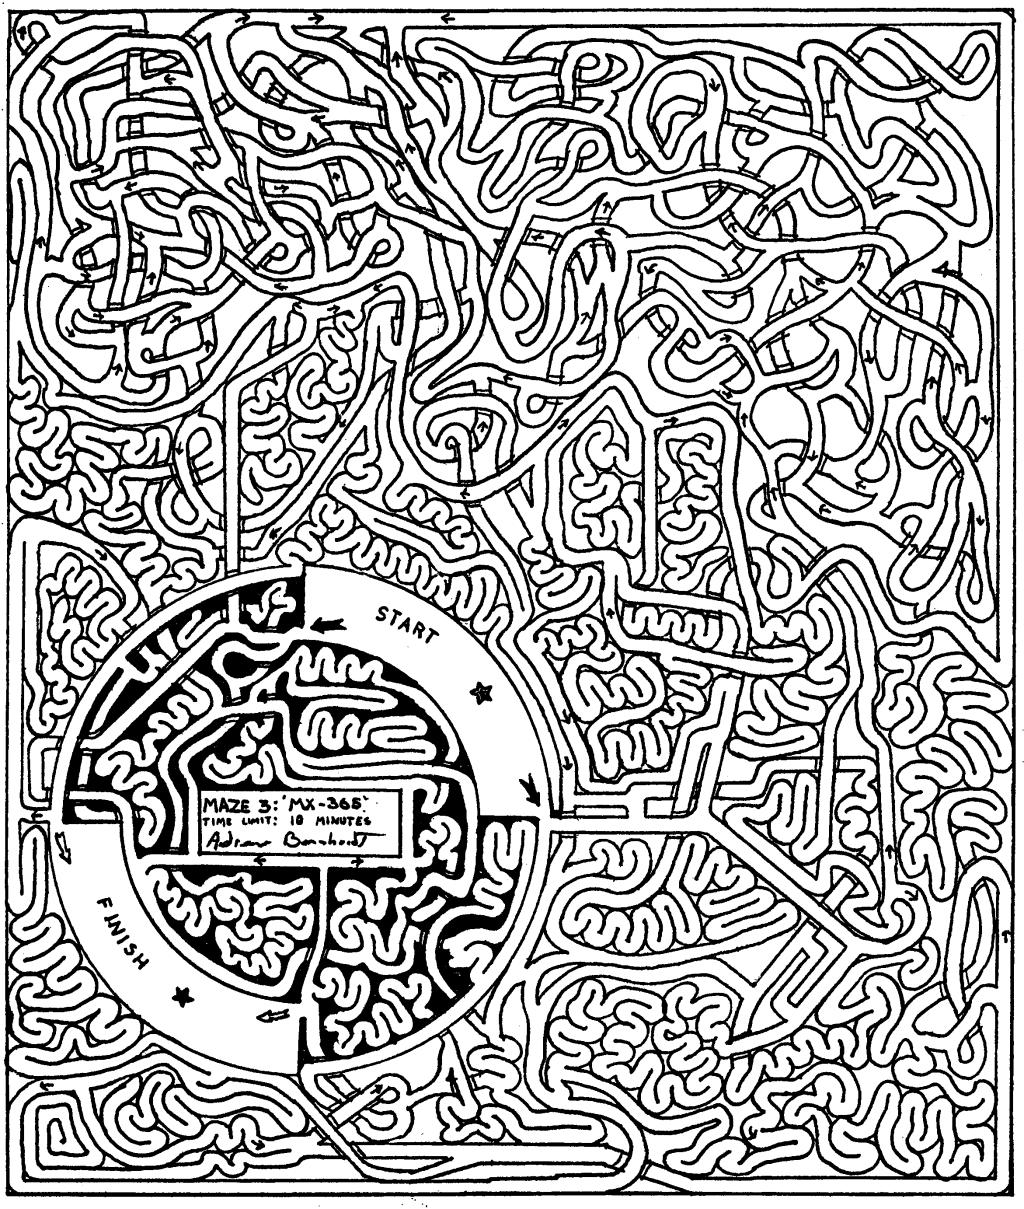 Drawn maze Drawn 10 a Bernhardt's An